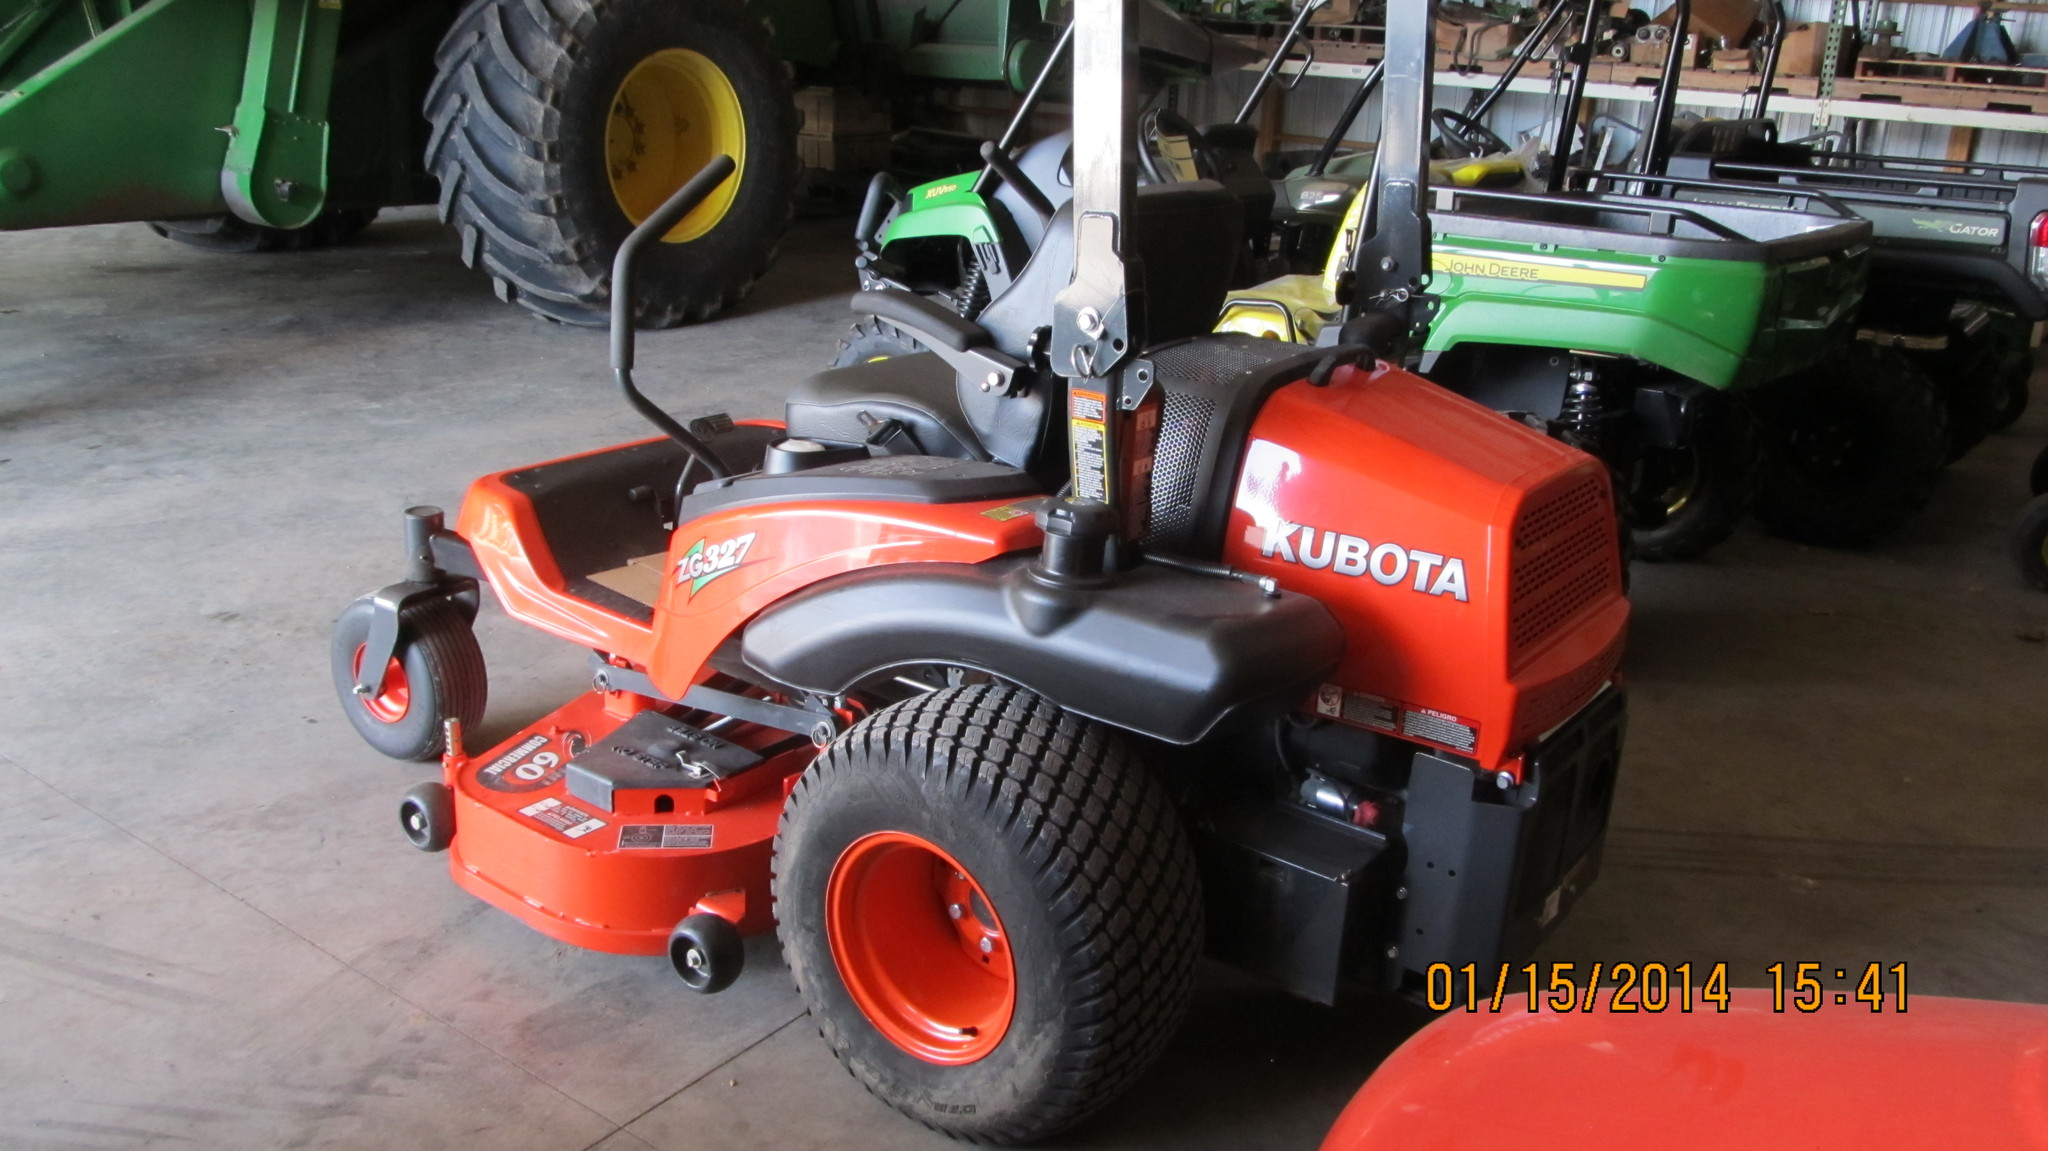 Kubota Zg20 Lawn Tractor Tractors Zd331 Wiring Diagrams Zg327